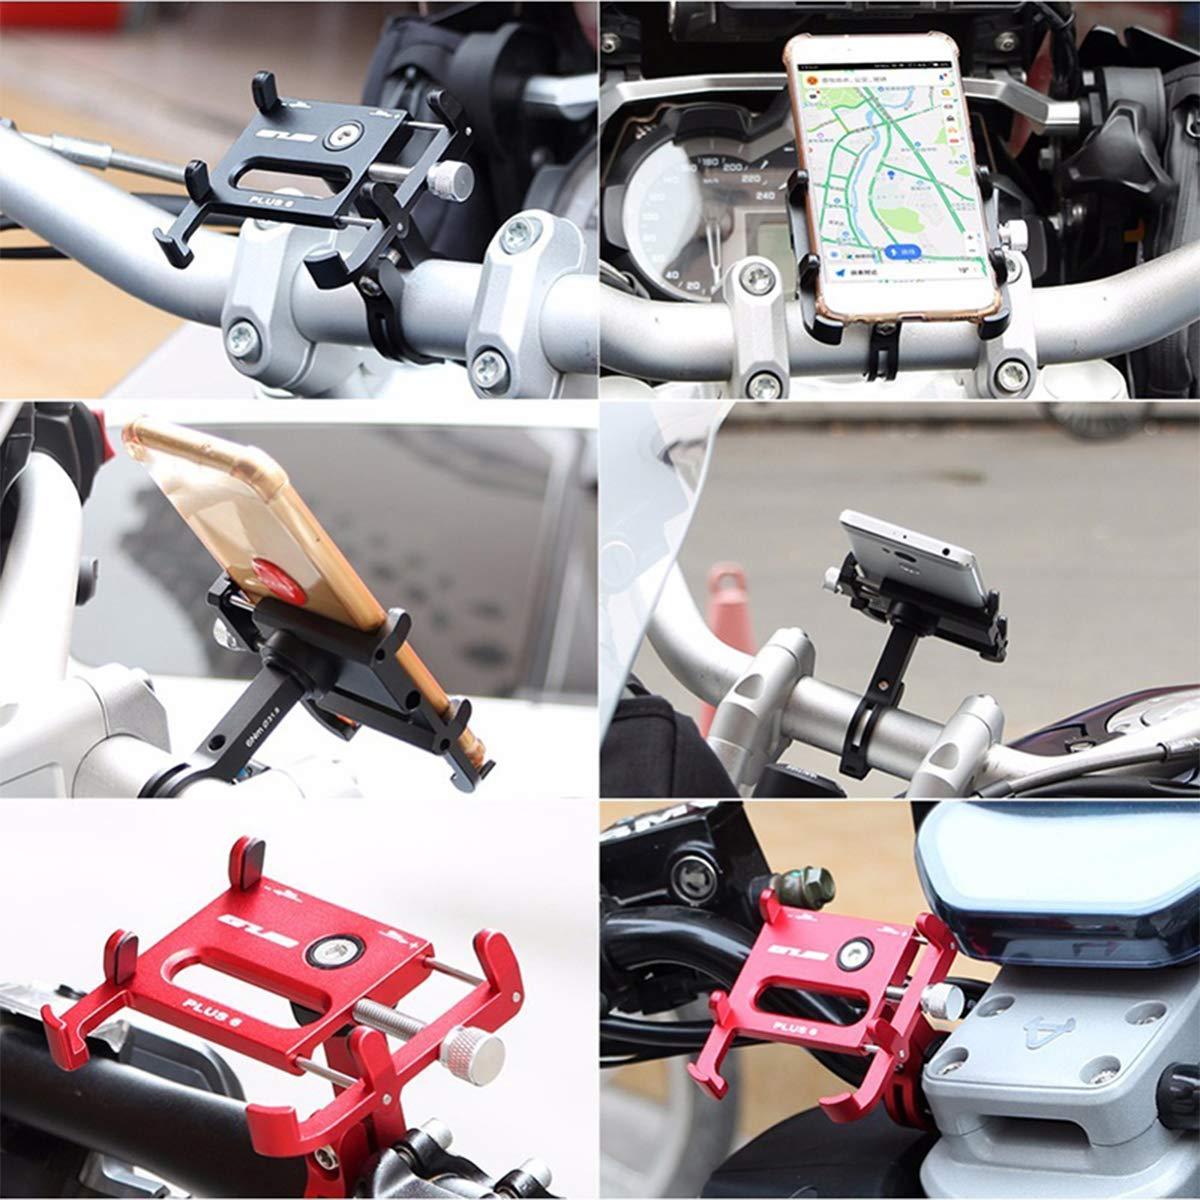 Blue Yannuo Trading GUB Bike Phone Holder Universal 360 Degree Rotation Aluminum Bicycle Handlebar//Motorcycle Handlebar Cell Phone Mount Clip Stand Bracket Holder Navigation Folder for Smart Phone